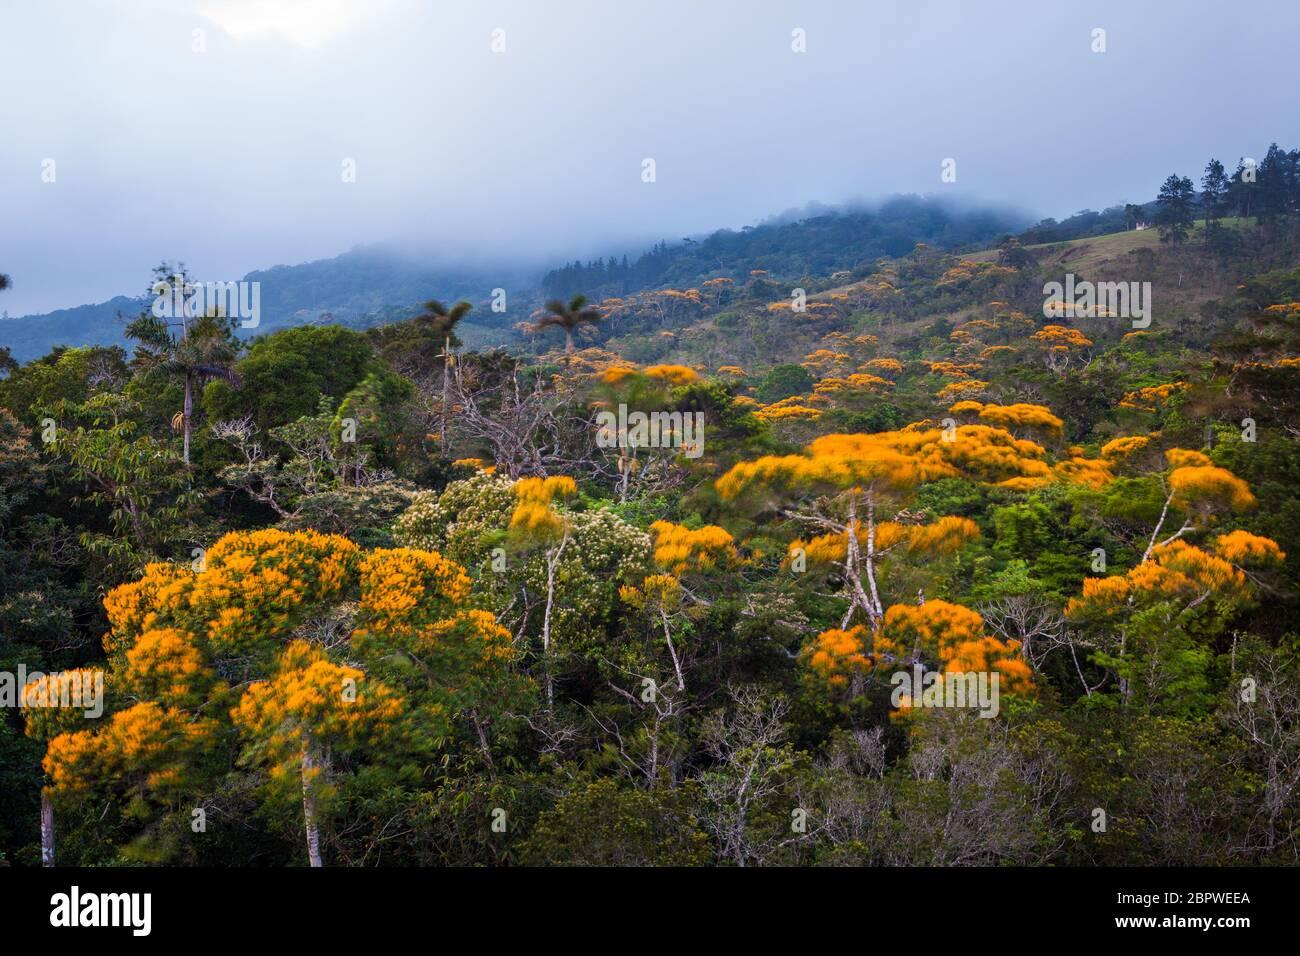 Flowering May Trees, Vochysia ferruginea, in the cloudforest of Altos de Campana national park, Republic of Panama. Stock Photo